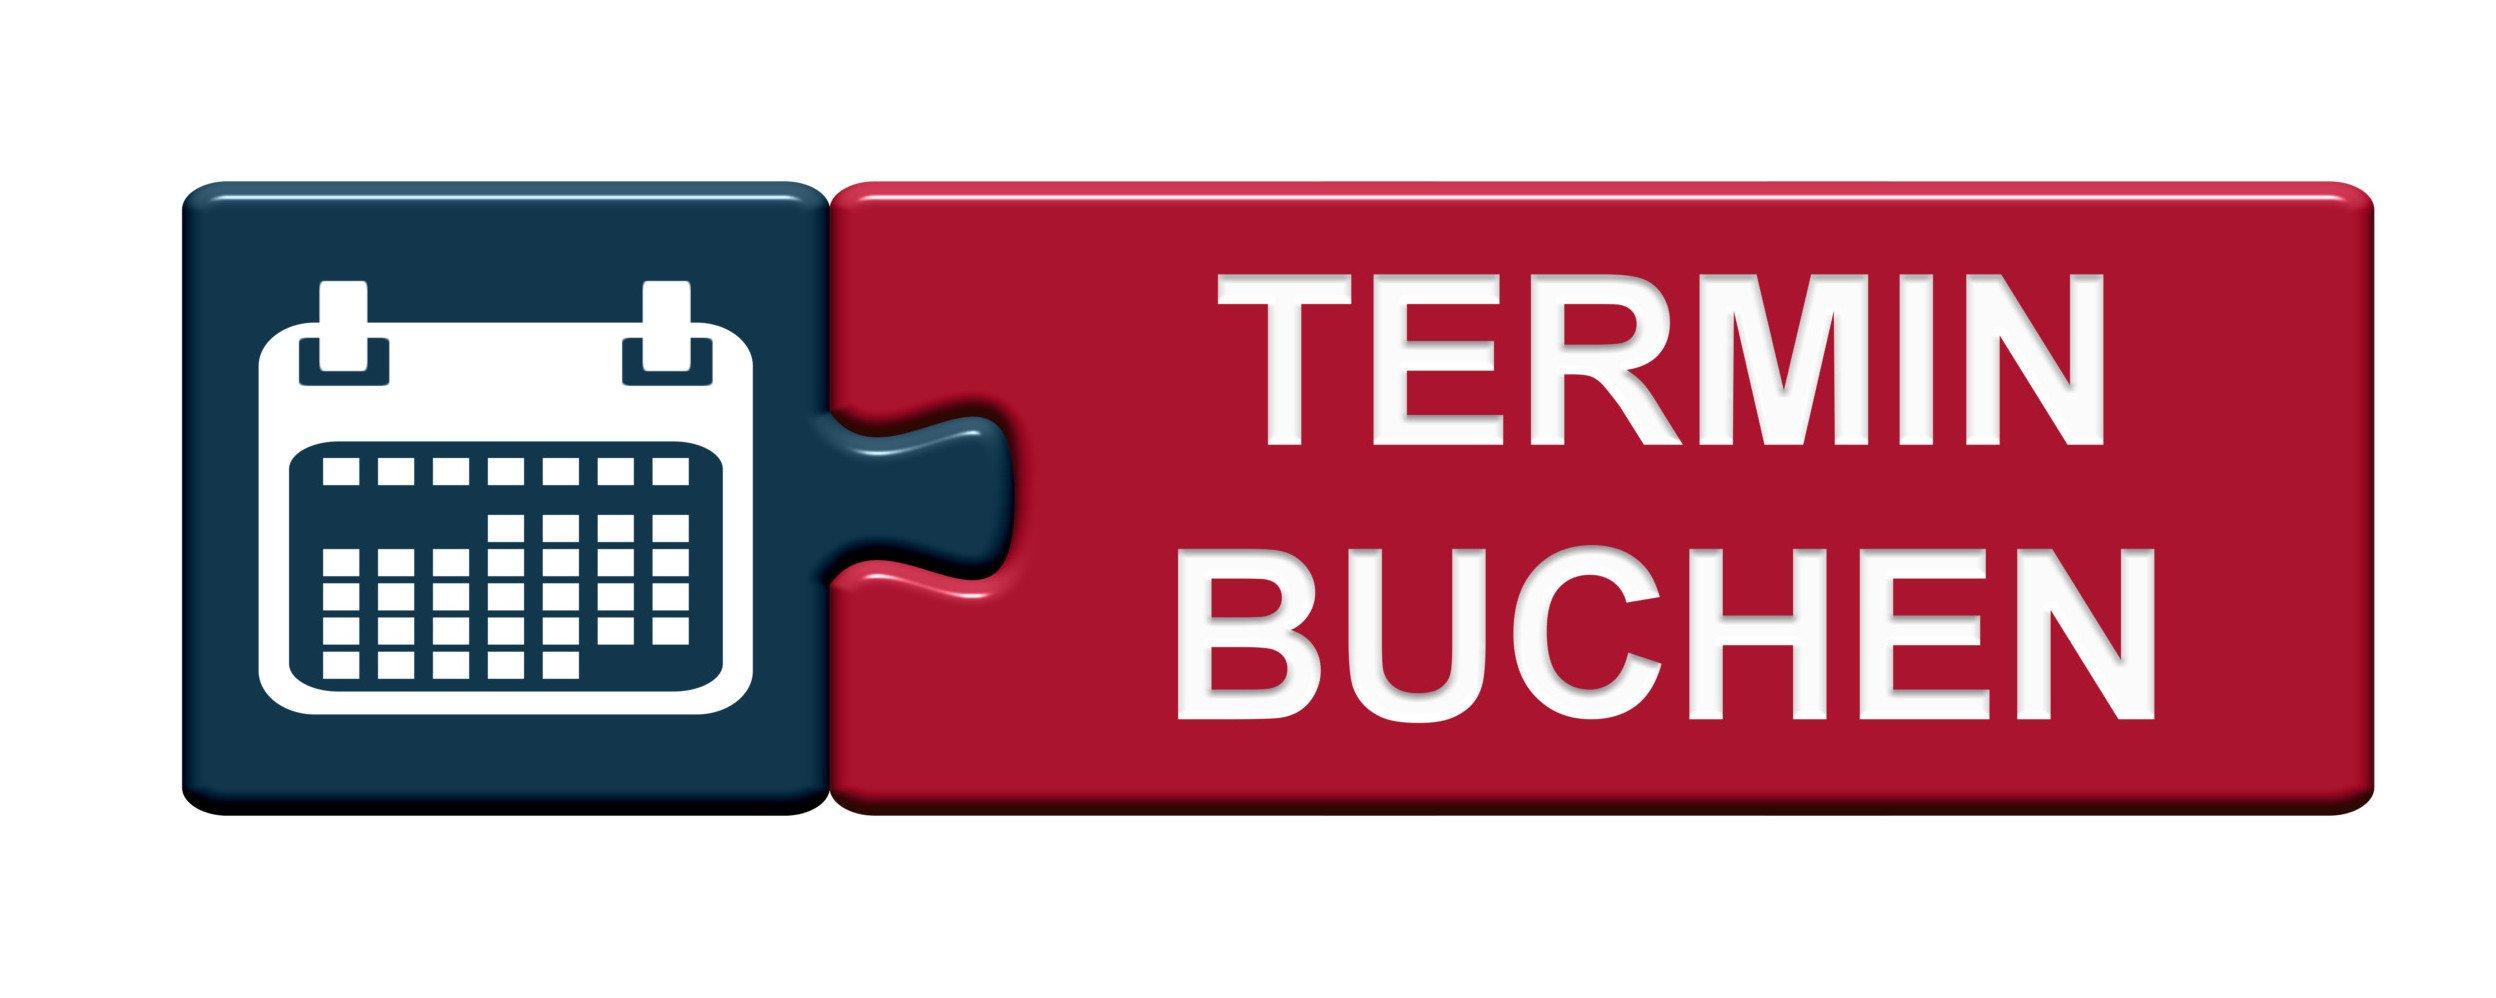 Termon online buchen top Beratung